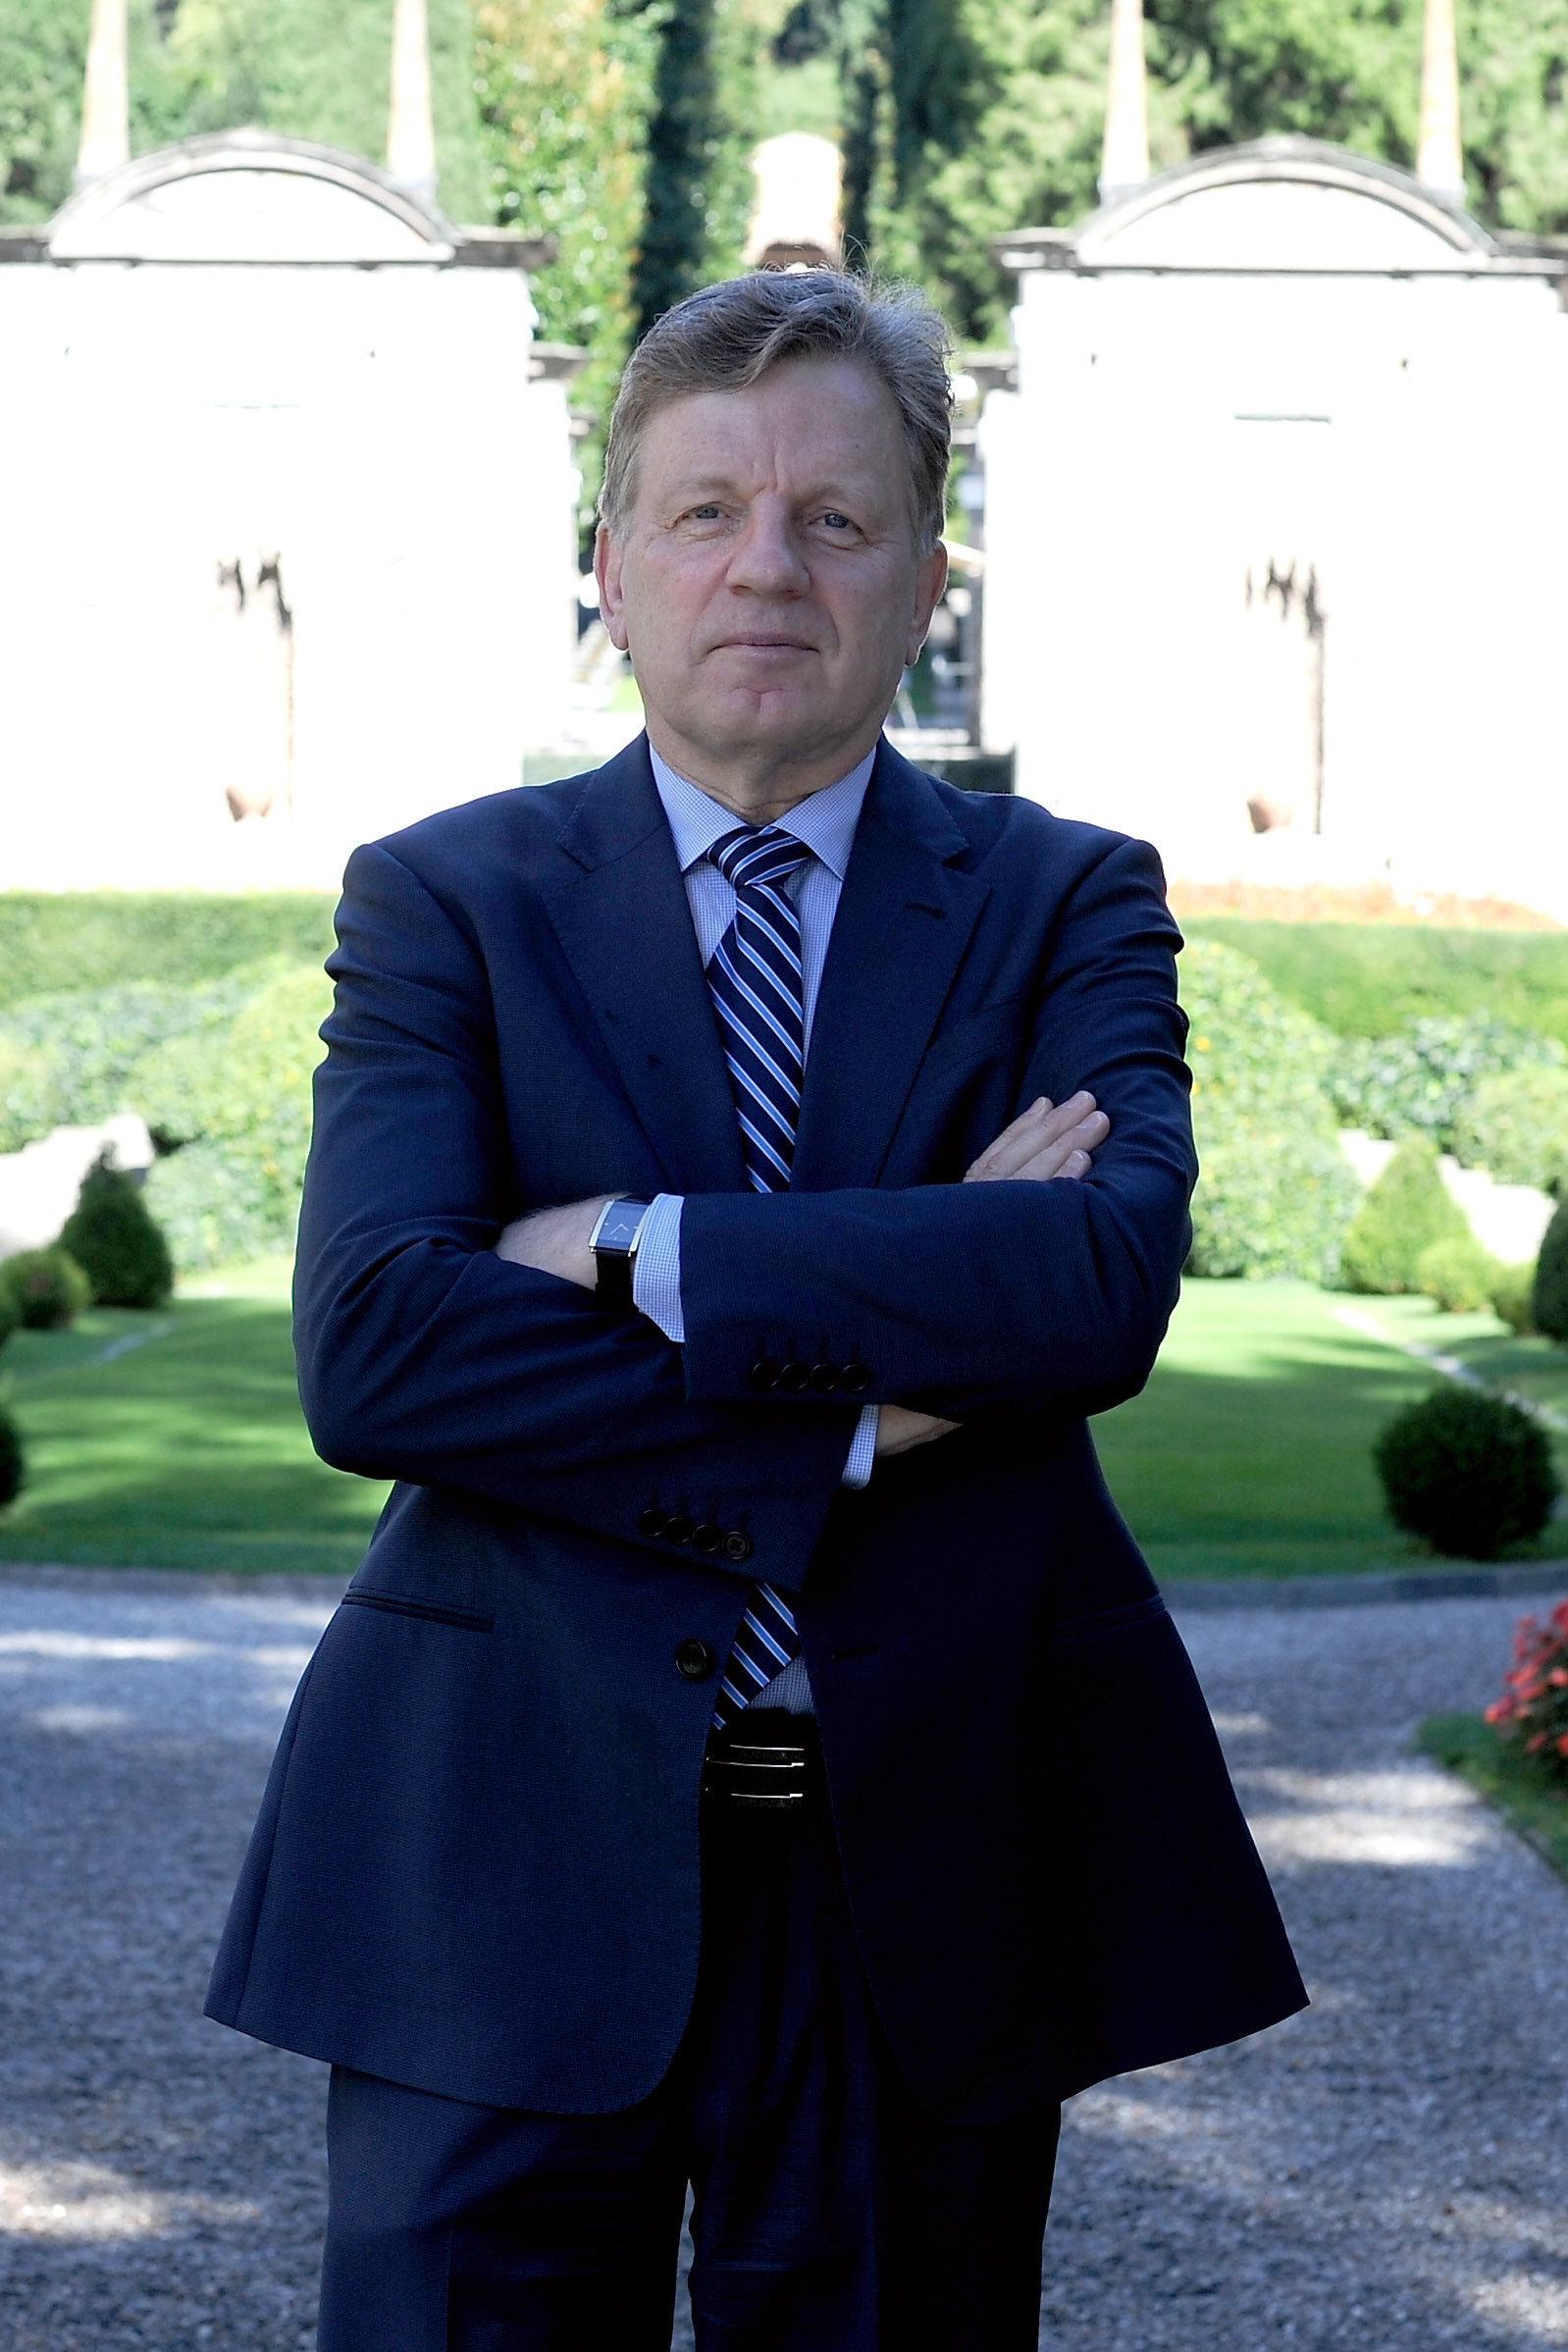 O πρώην πρωθυπουργός της Φινλανδίας,Εσκο Άχο στη HuffPost: Δουλειά ενός πρωθυπουργού δεν είναι η